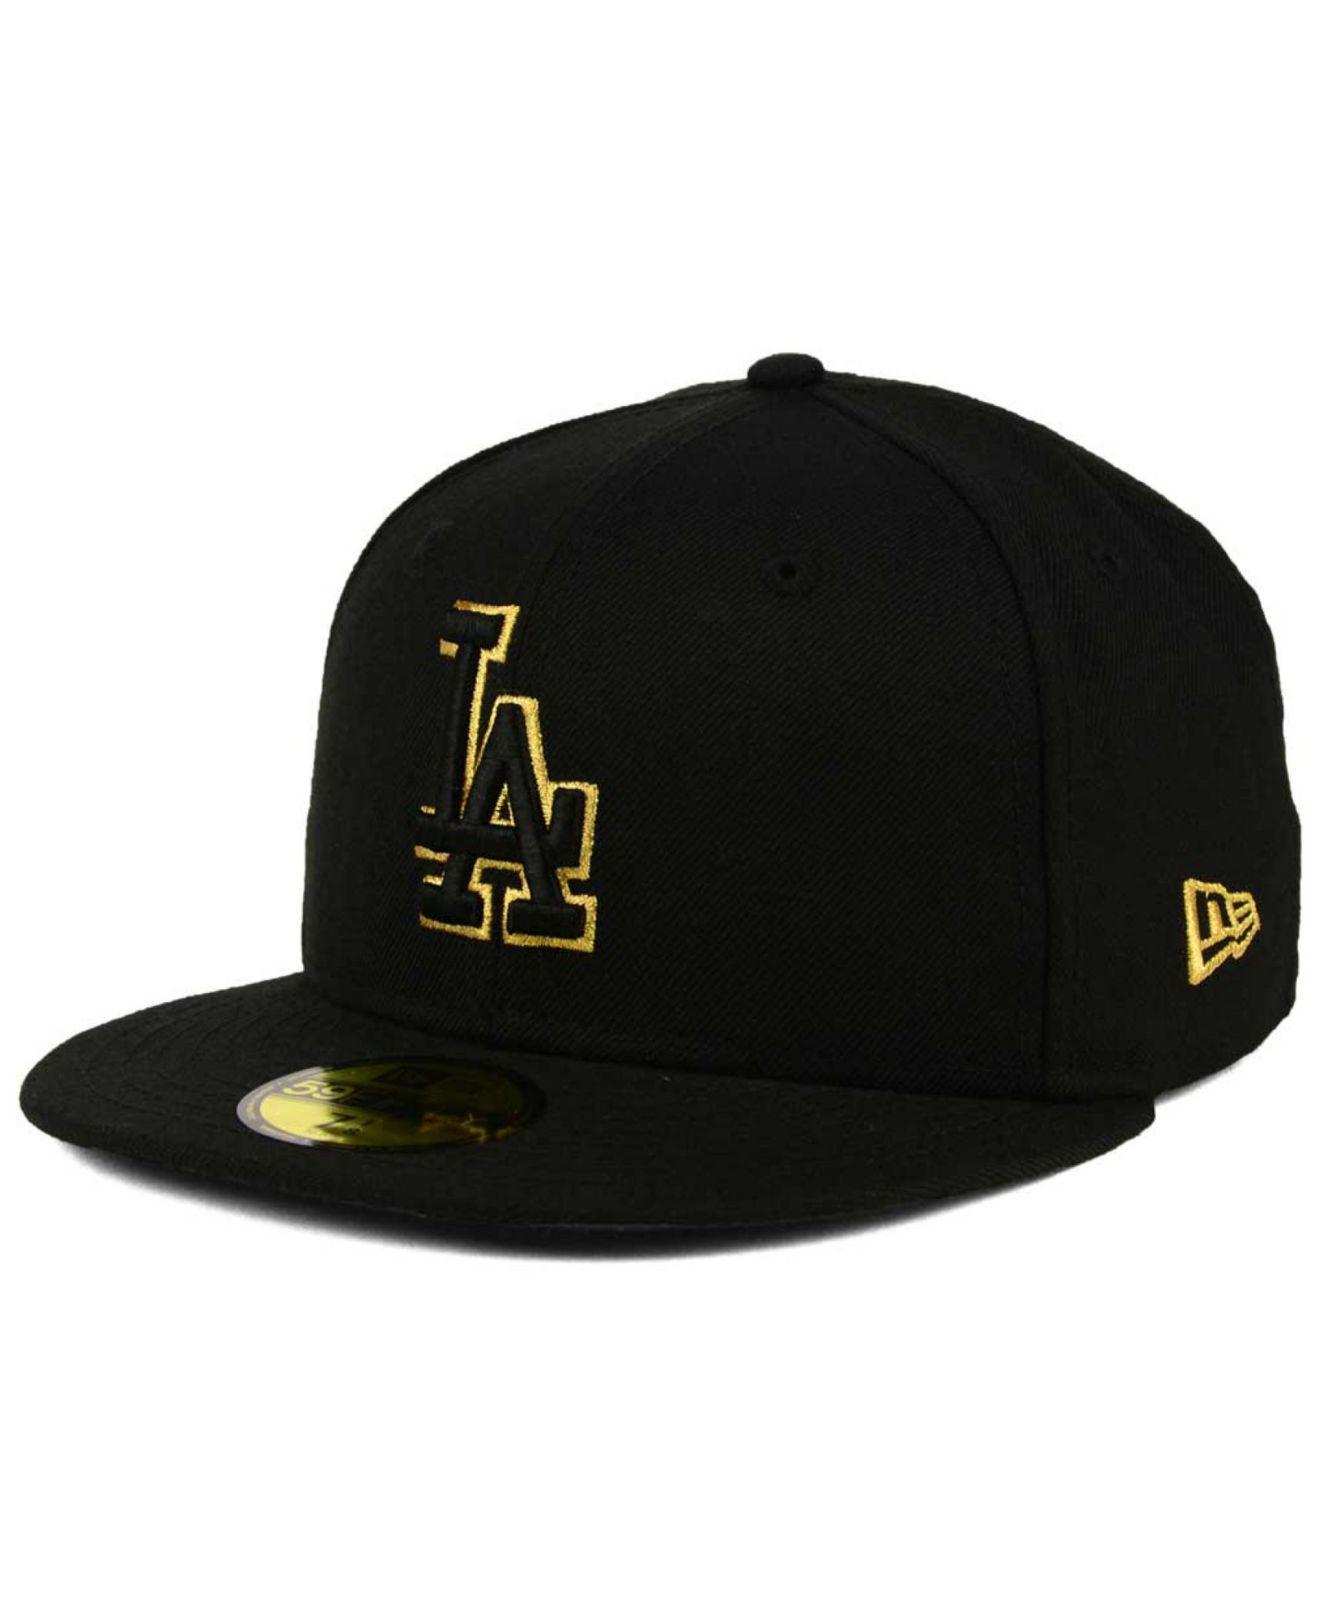 c49c79e5416 Lyst - Ktz Los Angeles Dodgers Black On Metallic Gold 59fifty Cap in ...